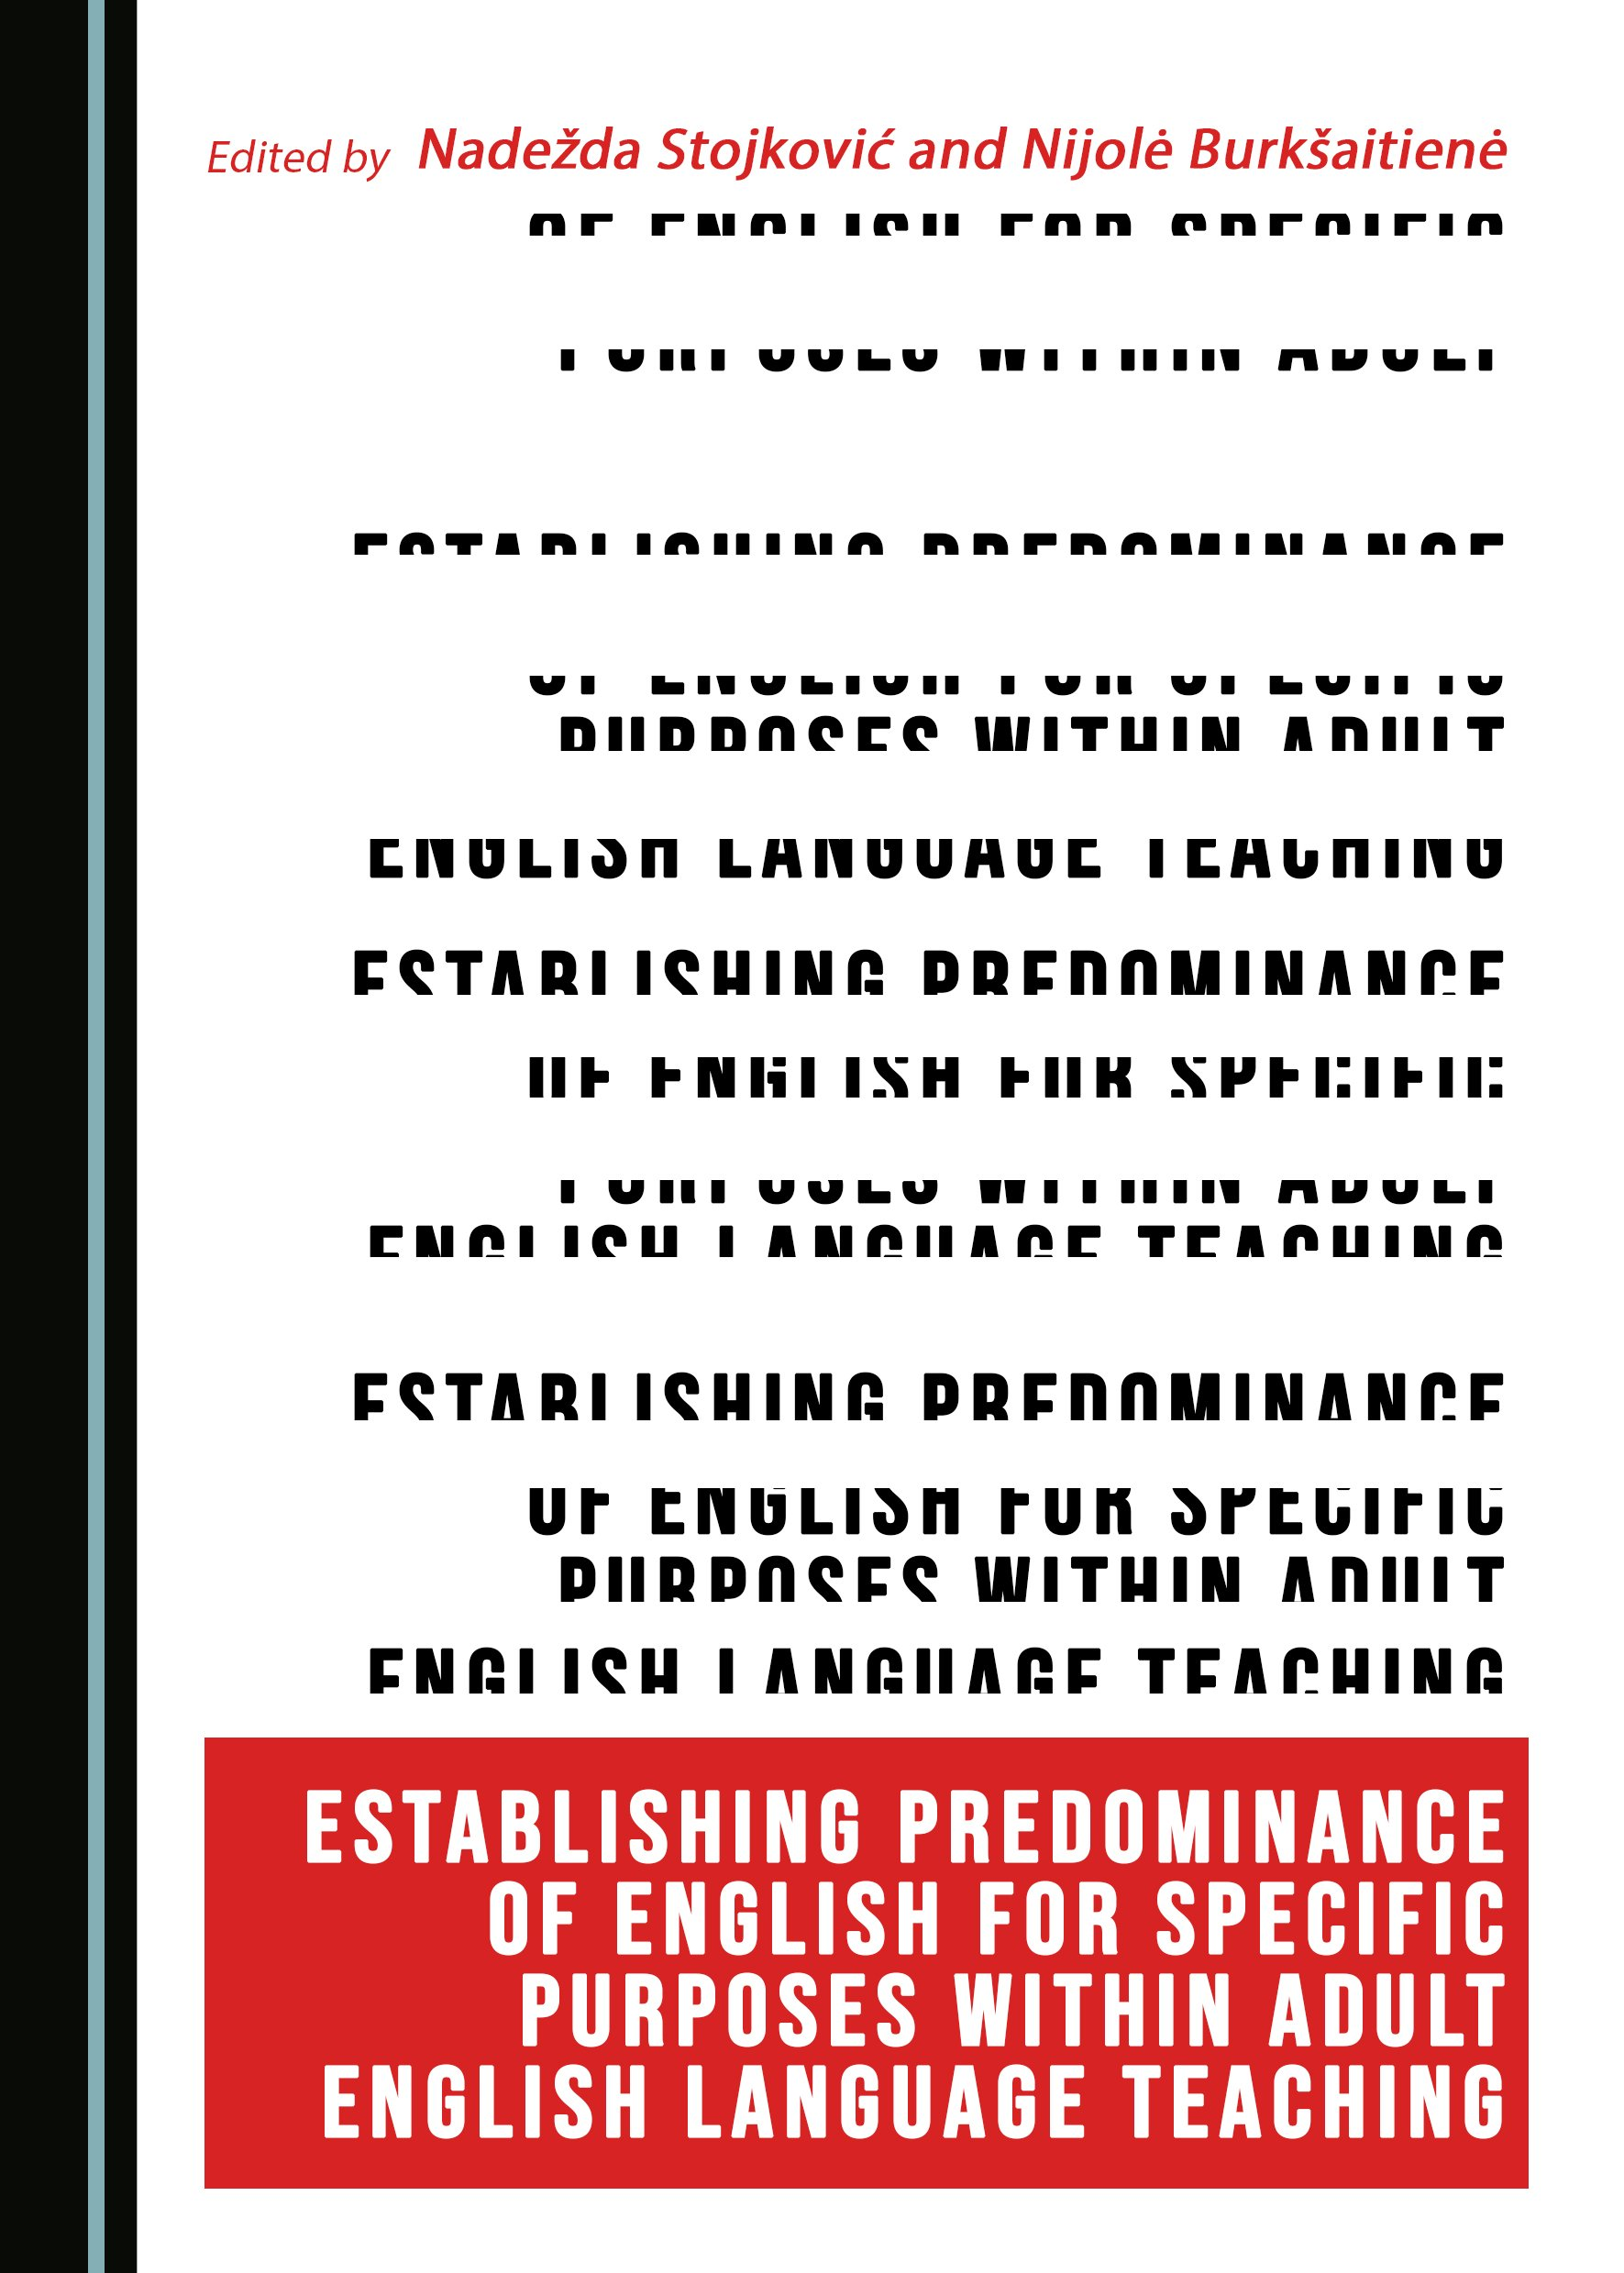 Establishing Predominance of English for Specific Purposes within Adult English Language Teaching